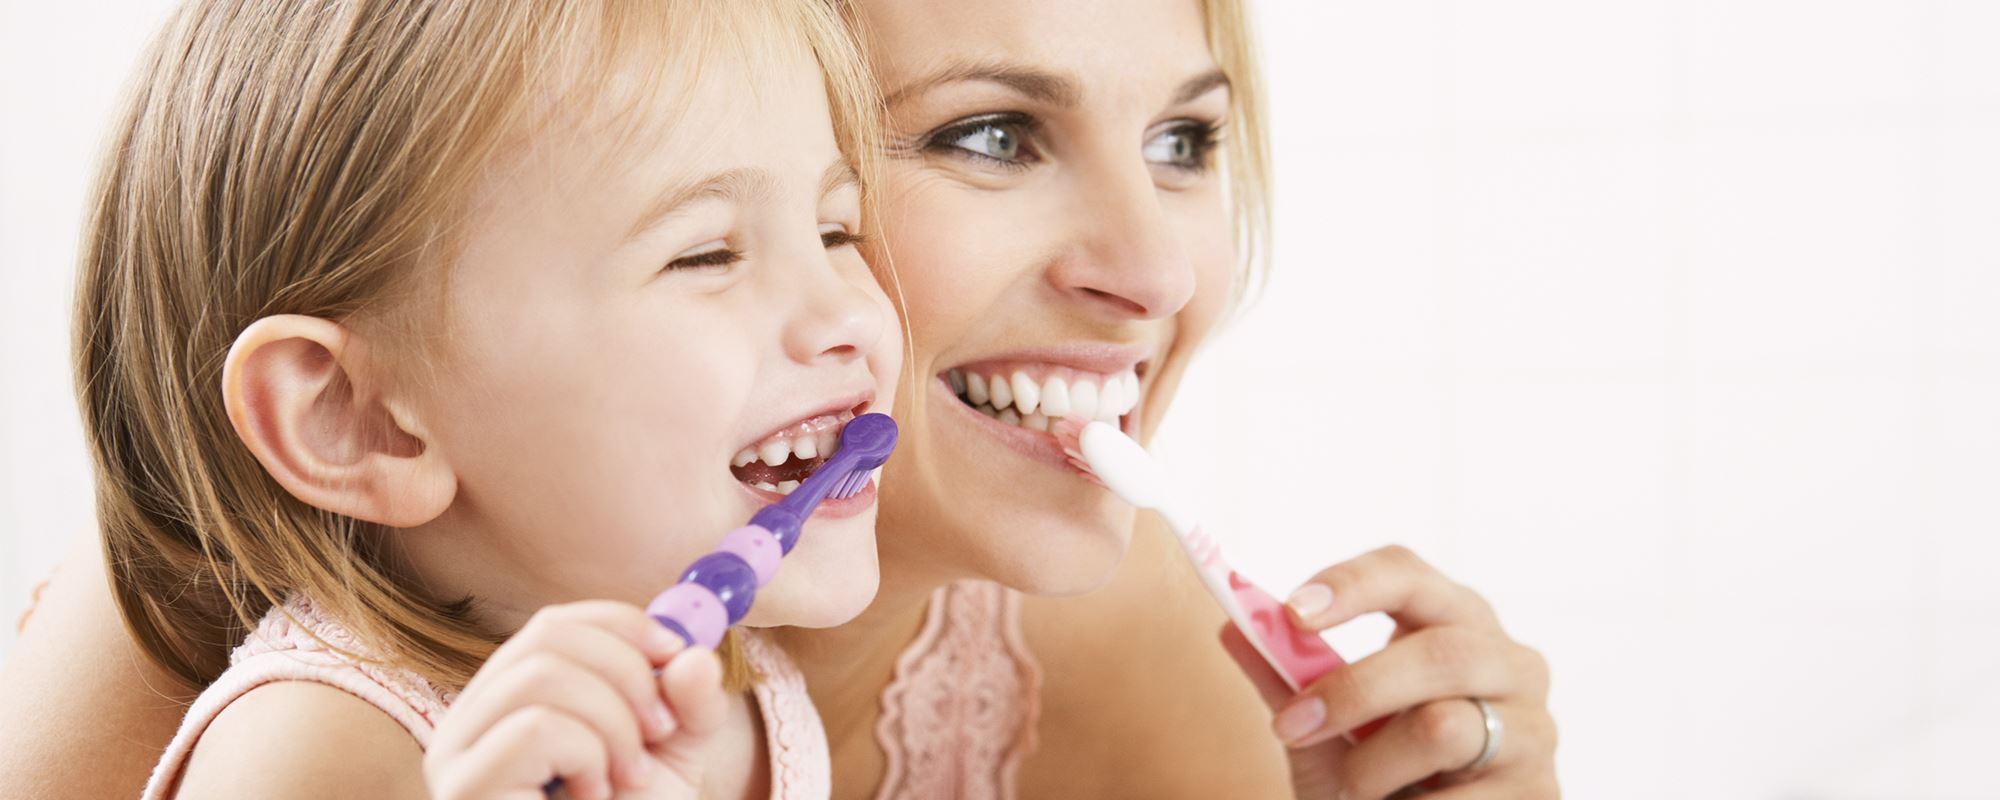 news lavare denti bambini